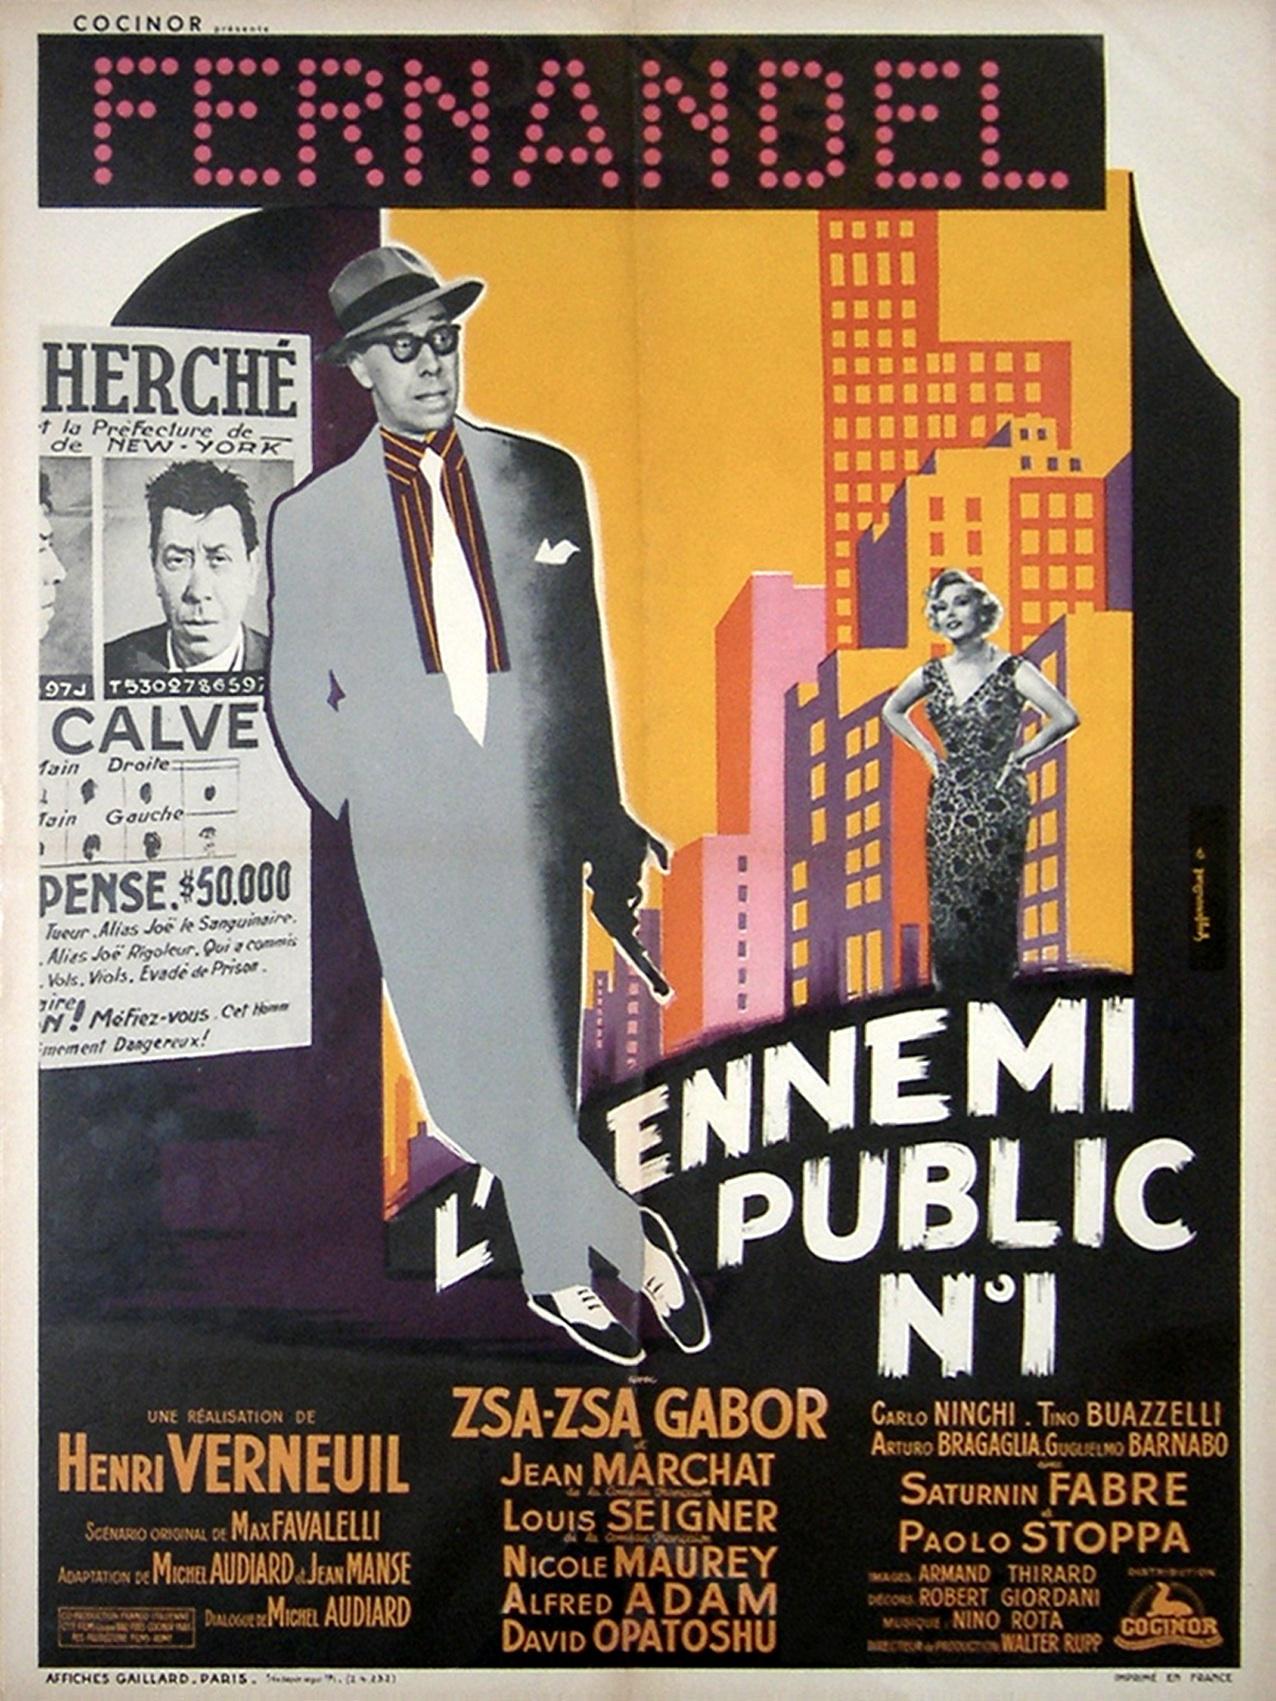 Zsa Zsa Gabor in L'ennemi public n° 1 (1953)